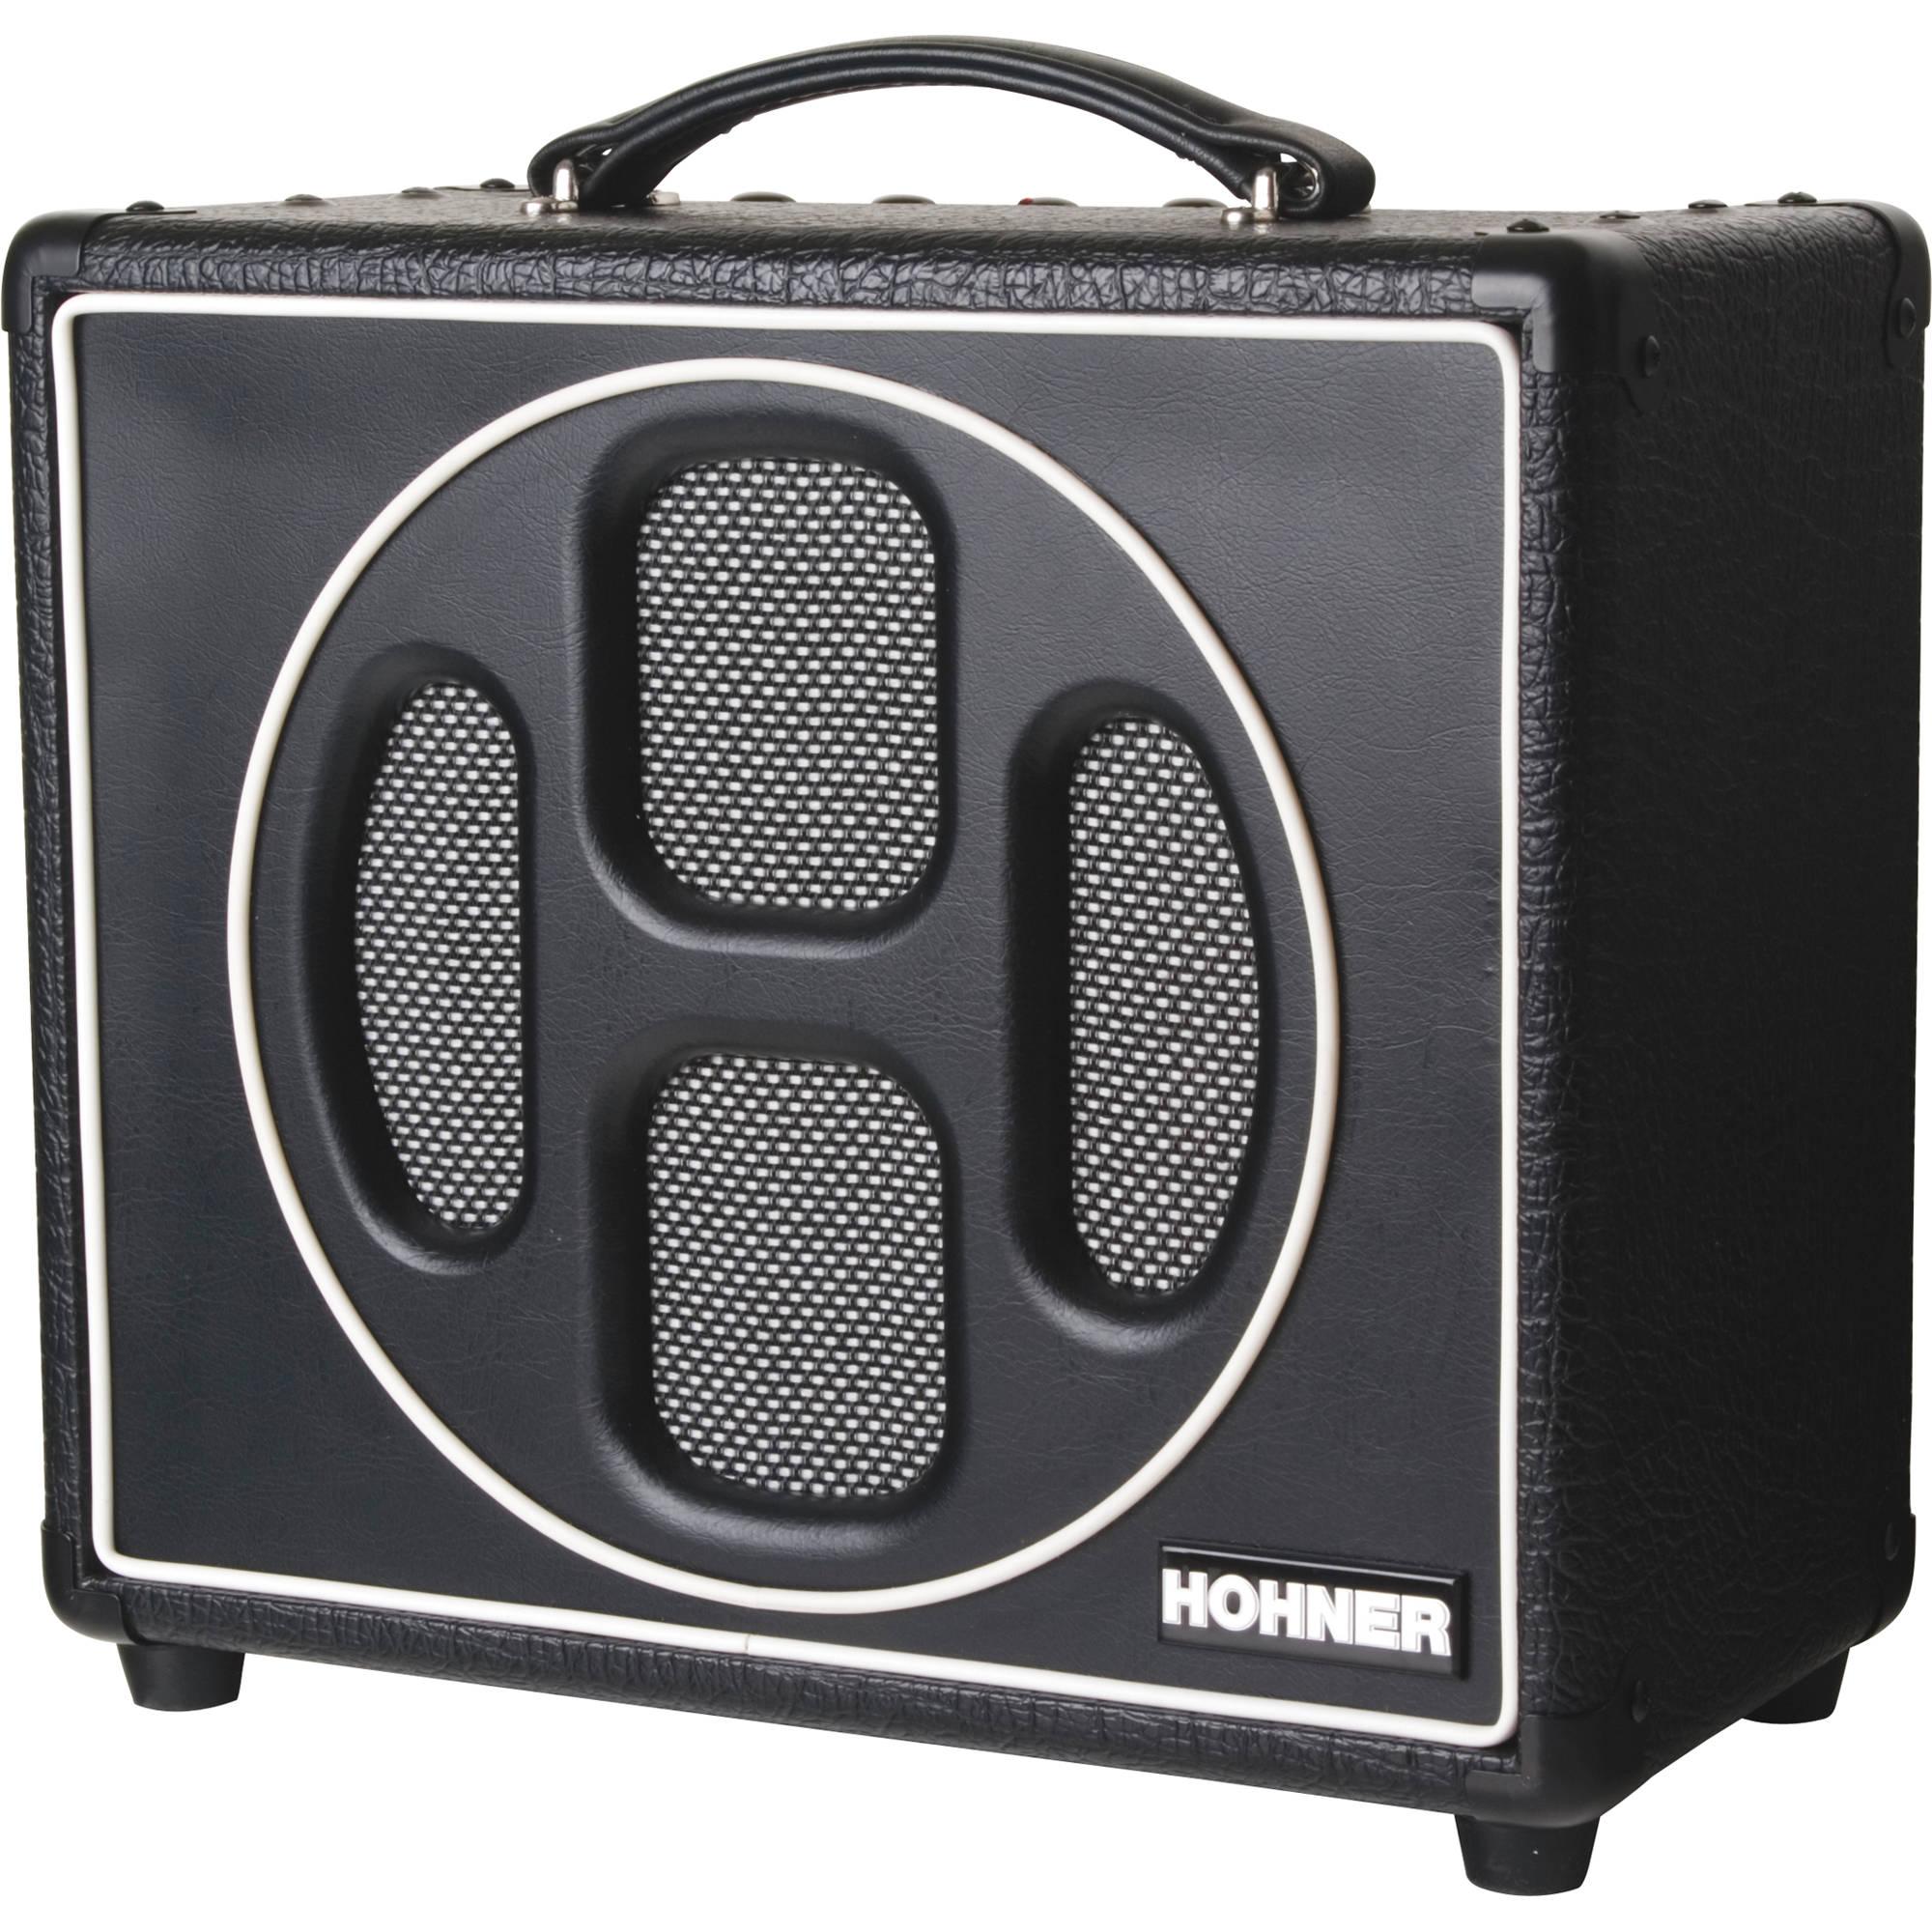 Hohner Hoodoo Box 5w Harmonica Tube Amp Hhb5t B Amp H Photo Video